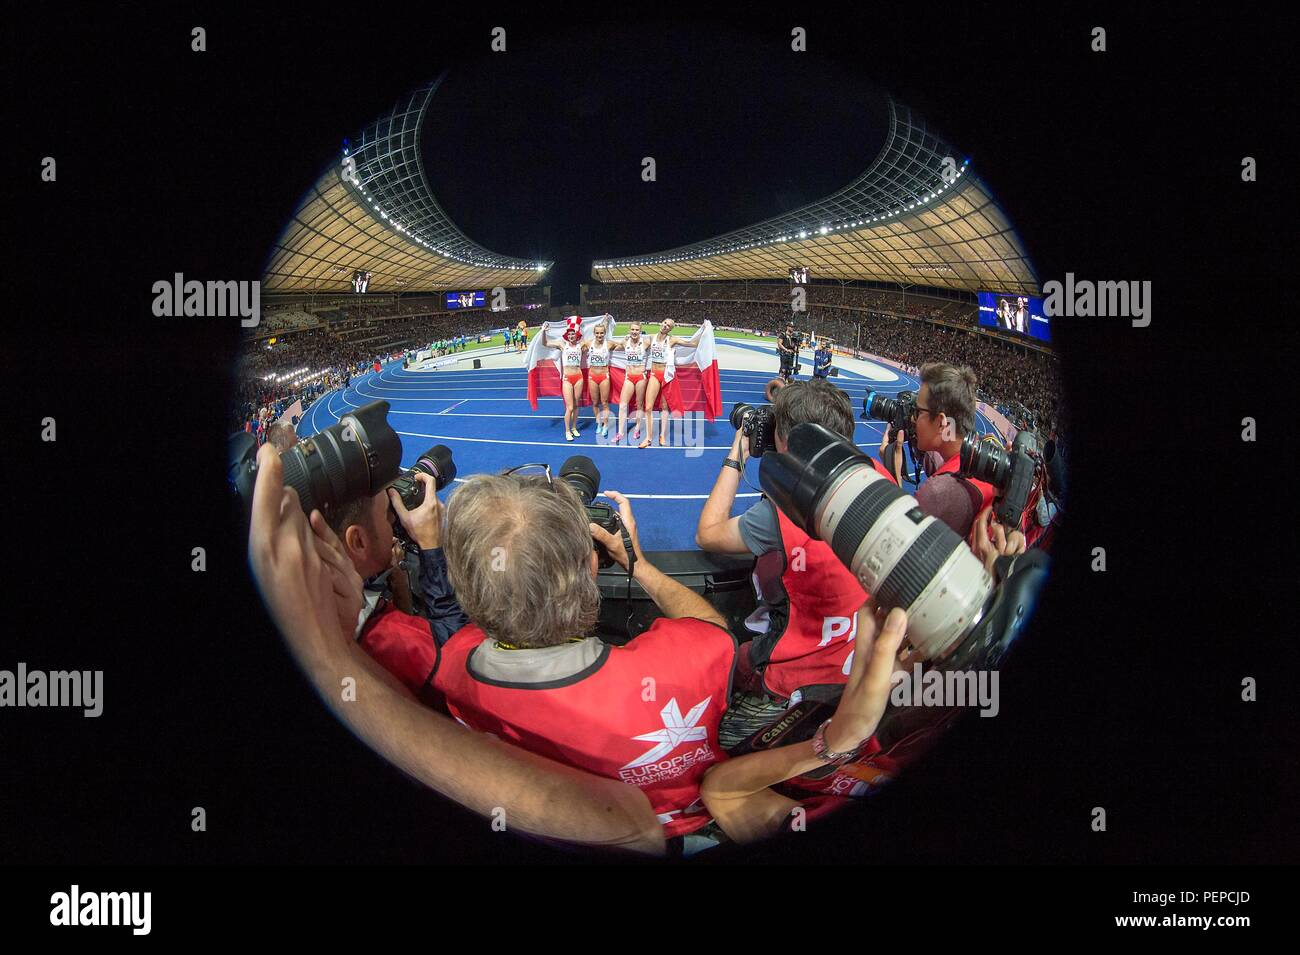 Berlin, Deutschland. 11th Aug, 2018. Feature, jubilation Team POL, 1st place, winner, in the focus of the photographers, with Malgorzata HOLUB-KOWALIK, Iga BAUMGART-WITAN, Patrycja WYCISZKIEWICZ, Justyna SWIETY-ERSETIC, Poland, final 4x400m women's relay, on 11.08.2018 European Athletics Championships 2018 in Berlin/Germany from 06.08. - 12.08.2018. | usage worldwide Credit: dpa/Alamy Live News - Stock Image